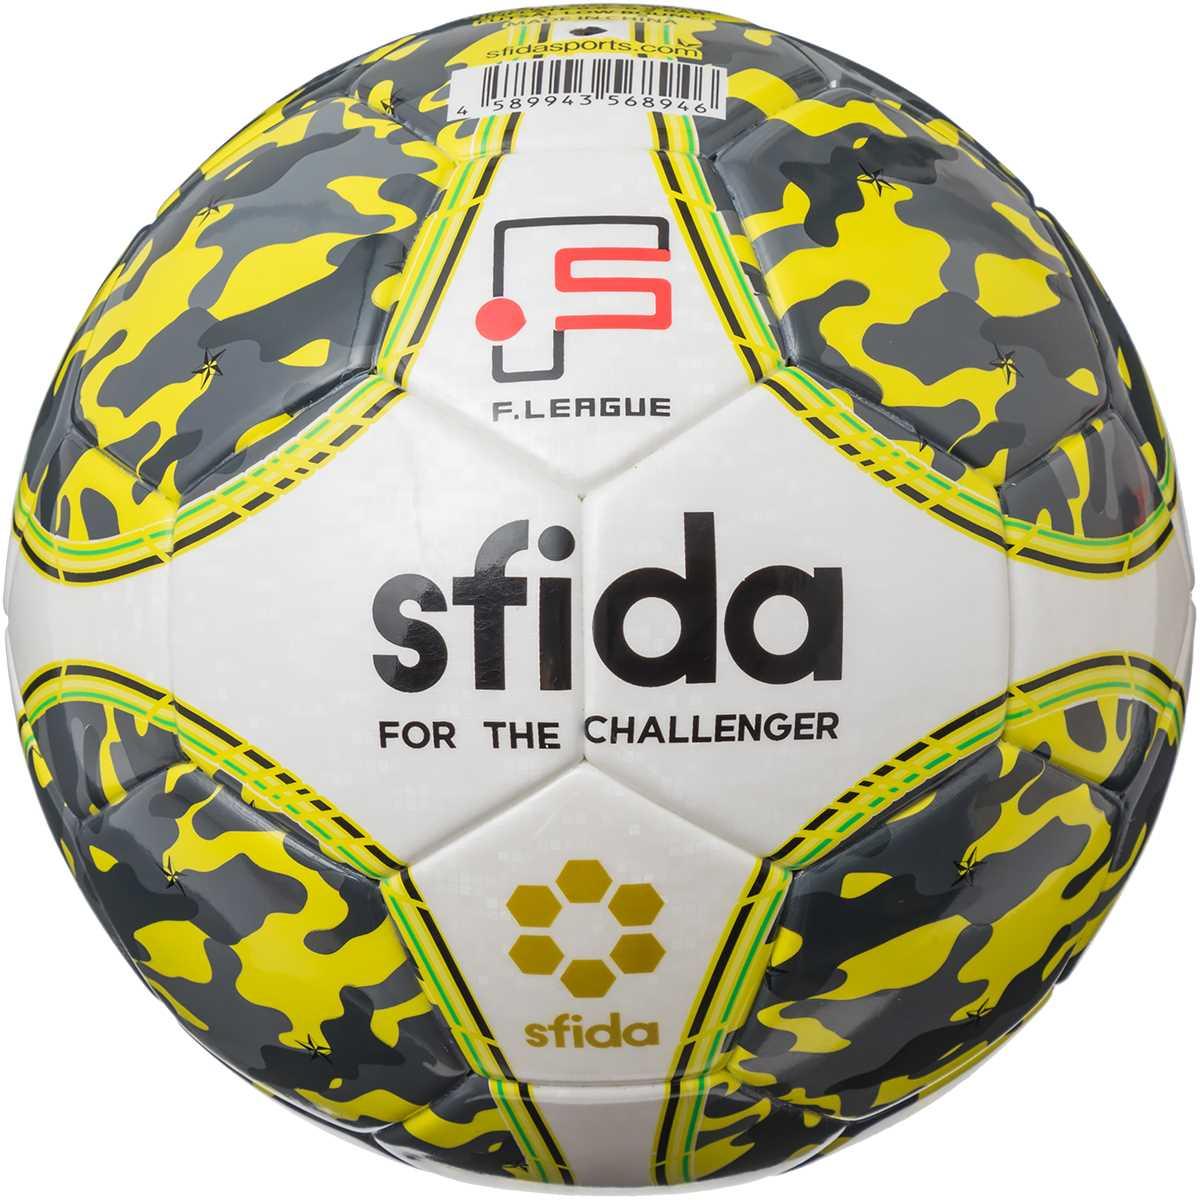 INFINITO NEO PRO 手縫いフットサルボール フットサルFリーグ公式球仕様